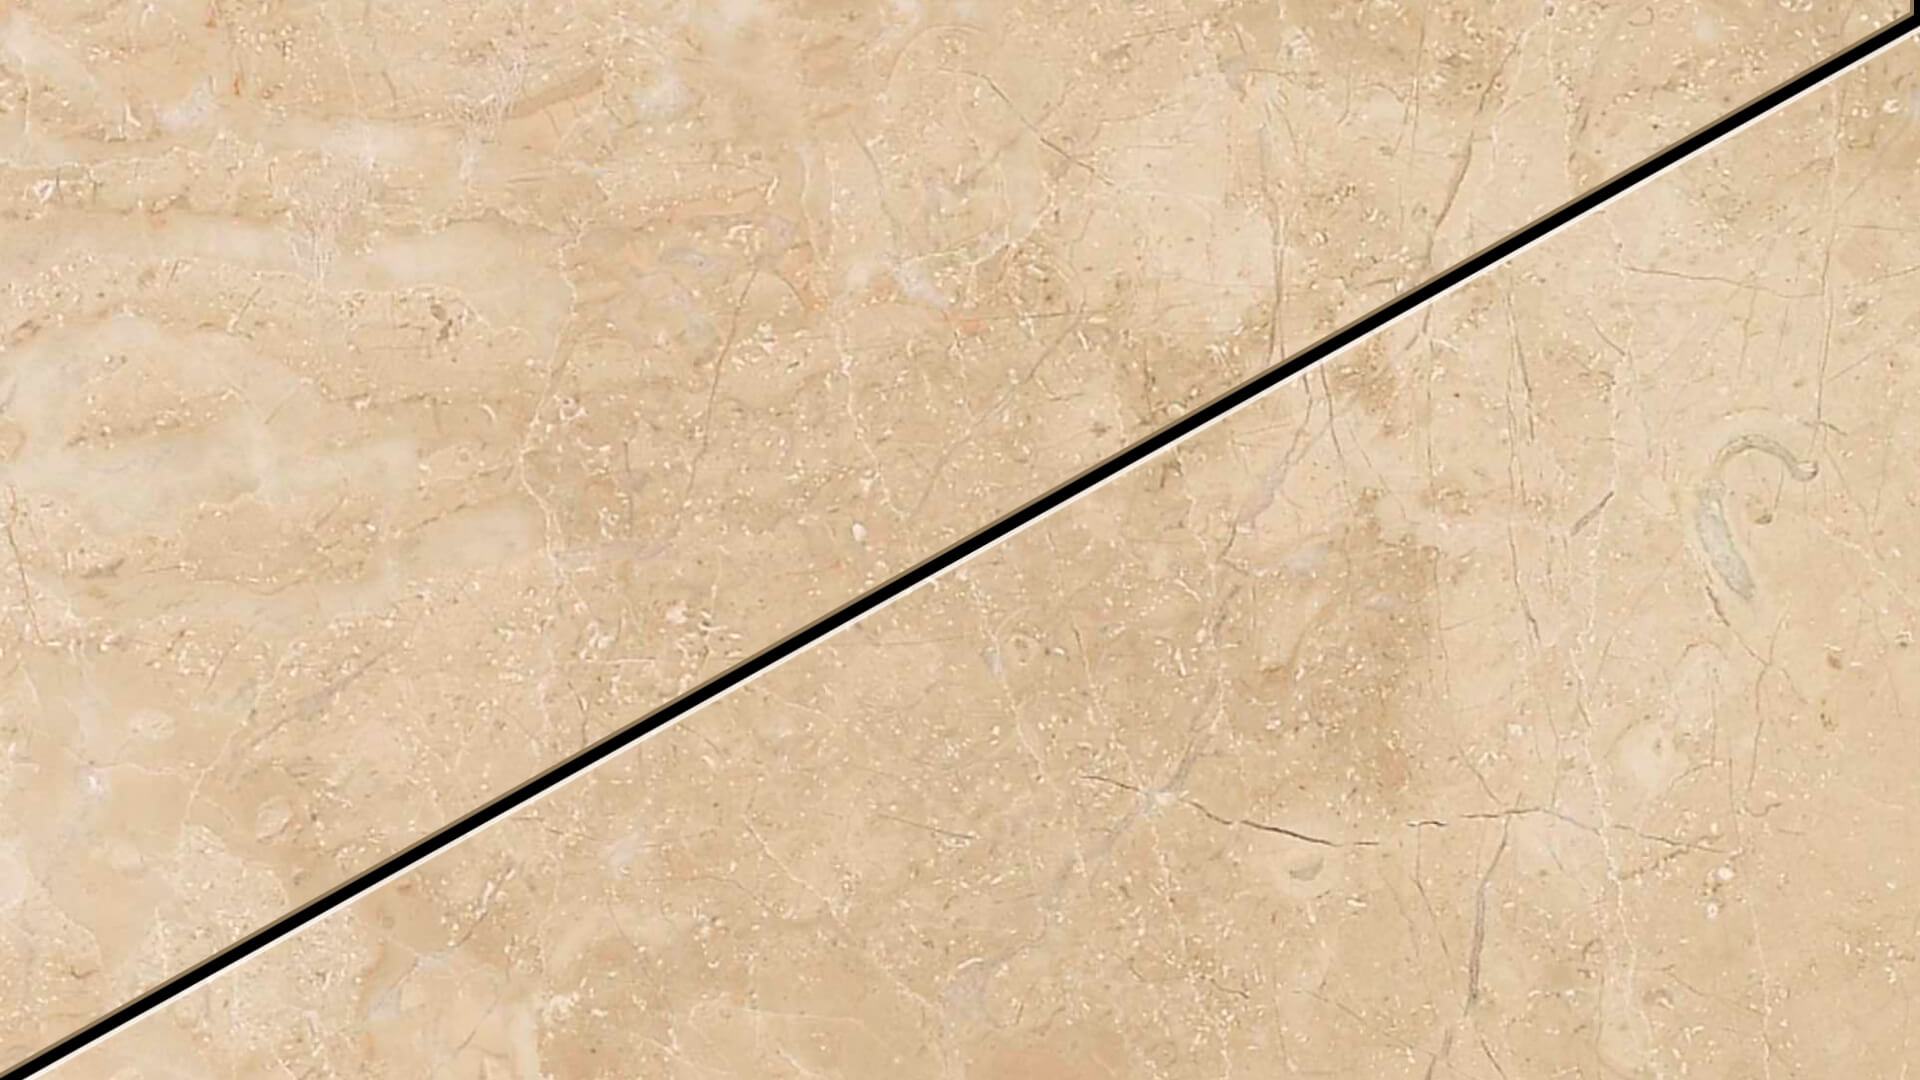 Tagliapiastrelle rubi tools italia